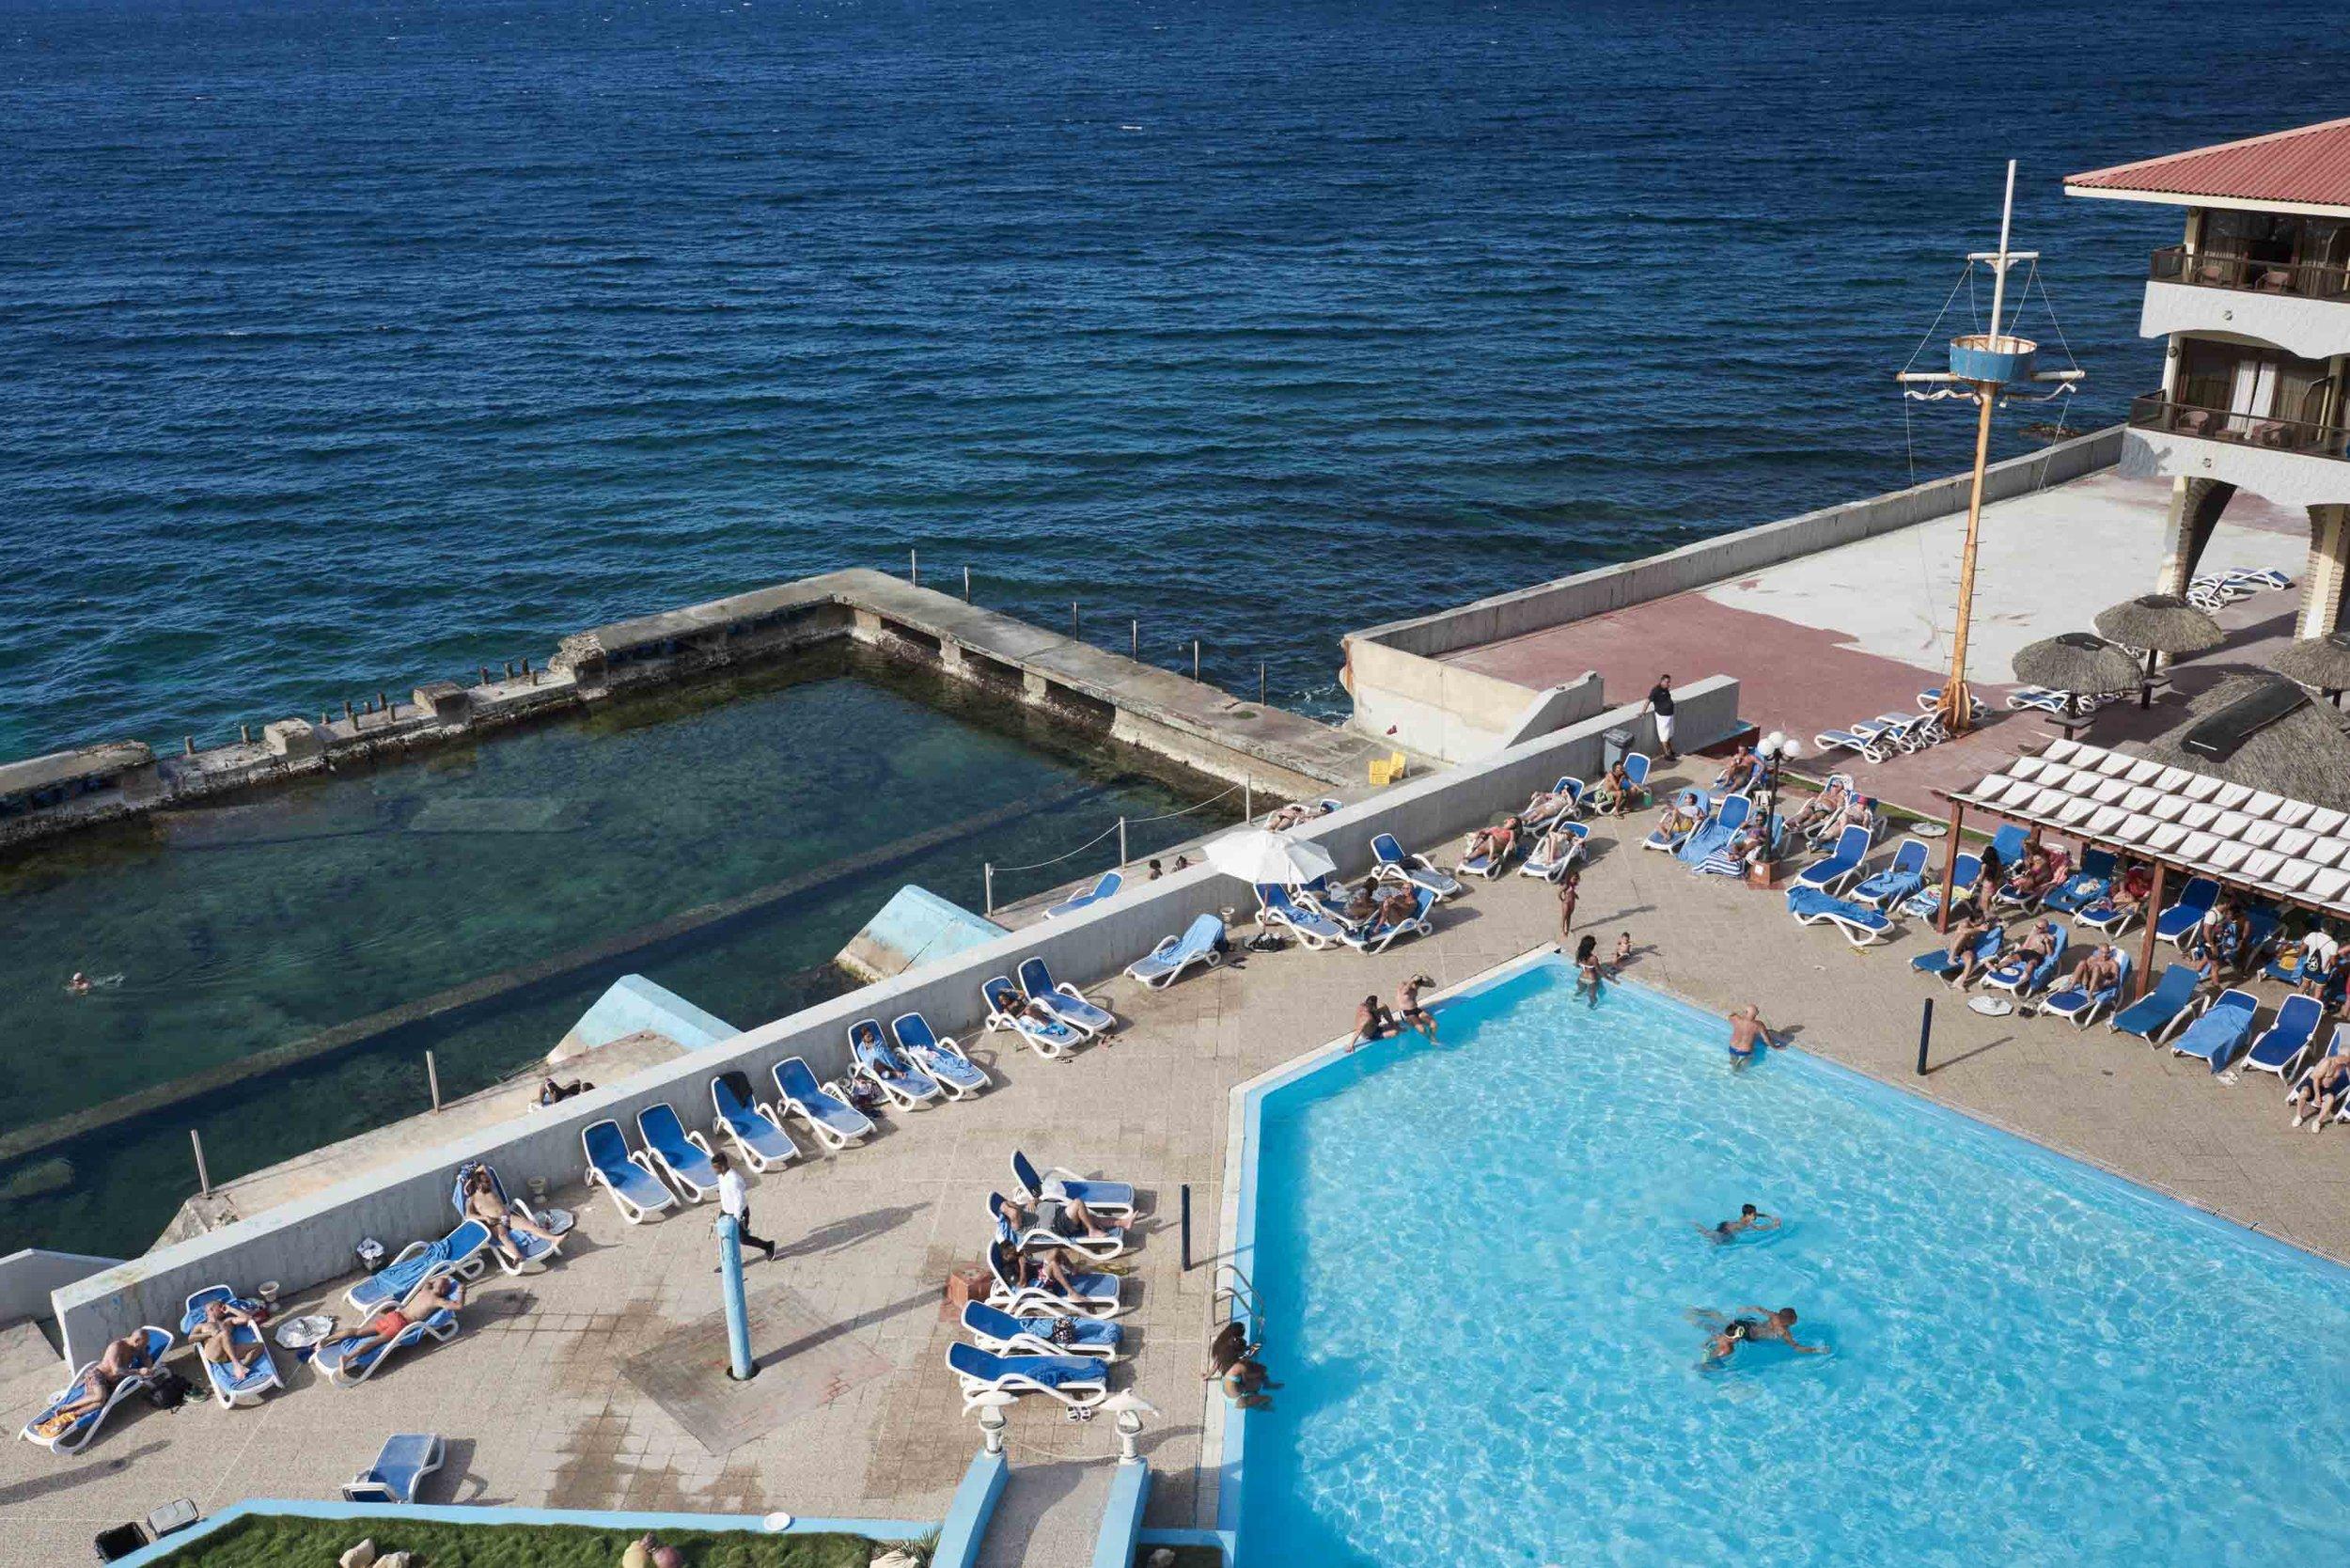 Havana-swimming-spots-Club-Havana-Photo-credit-Rama-Knight-5.jpg